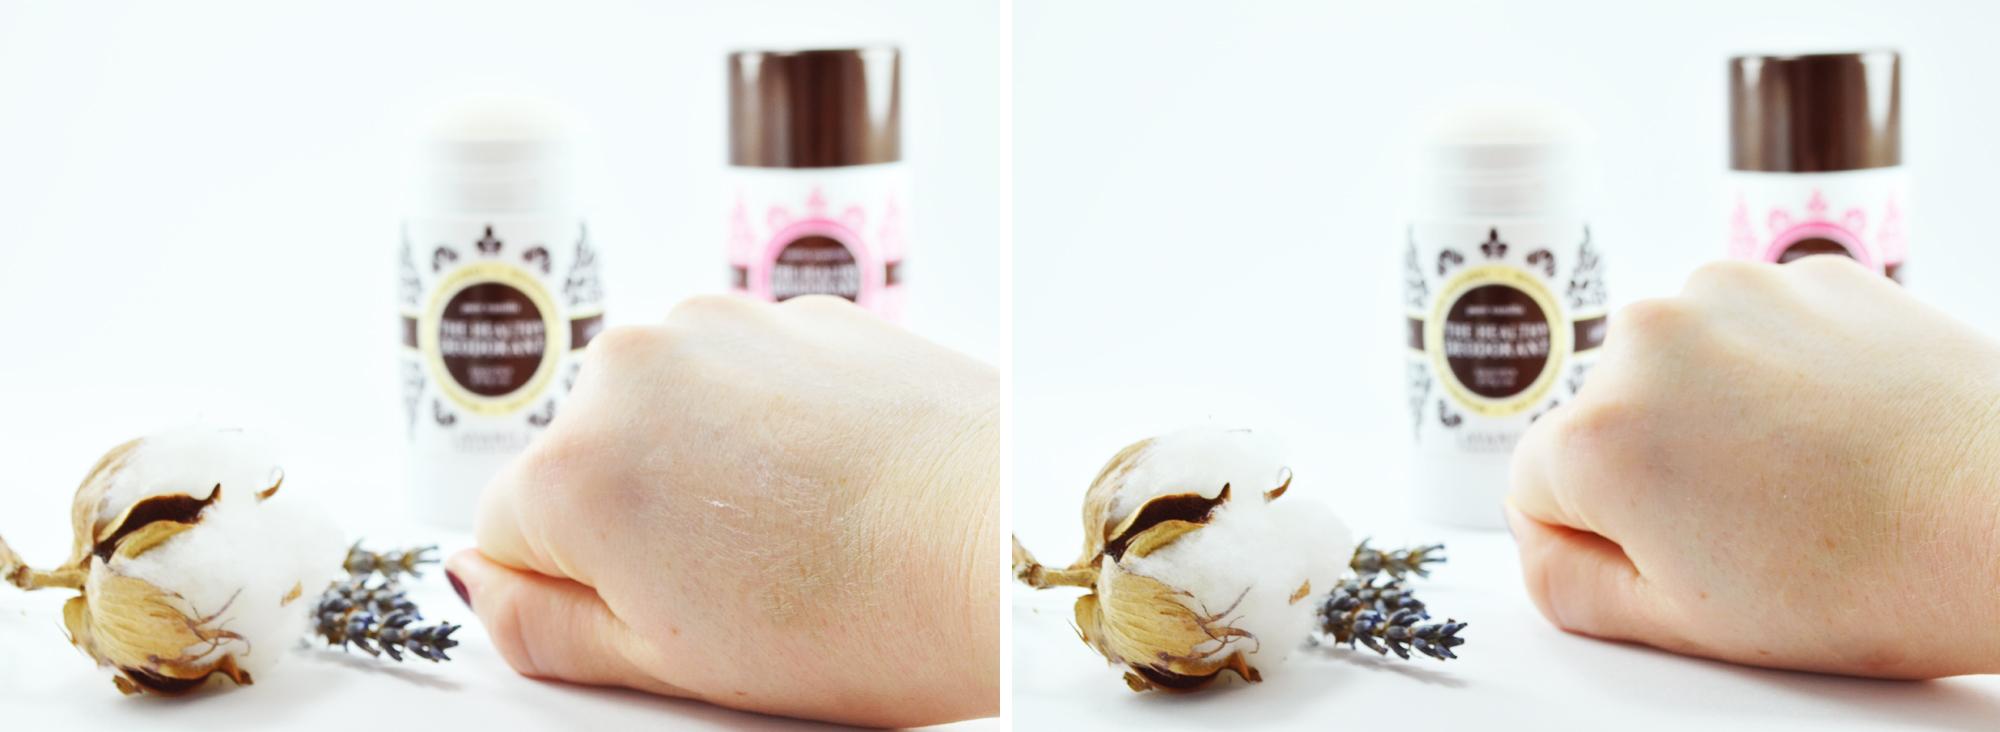 the-healthy-deodorant-lavanila-avant-apres-sans-traces